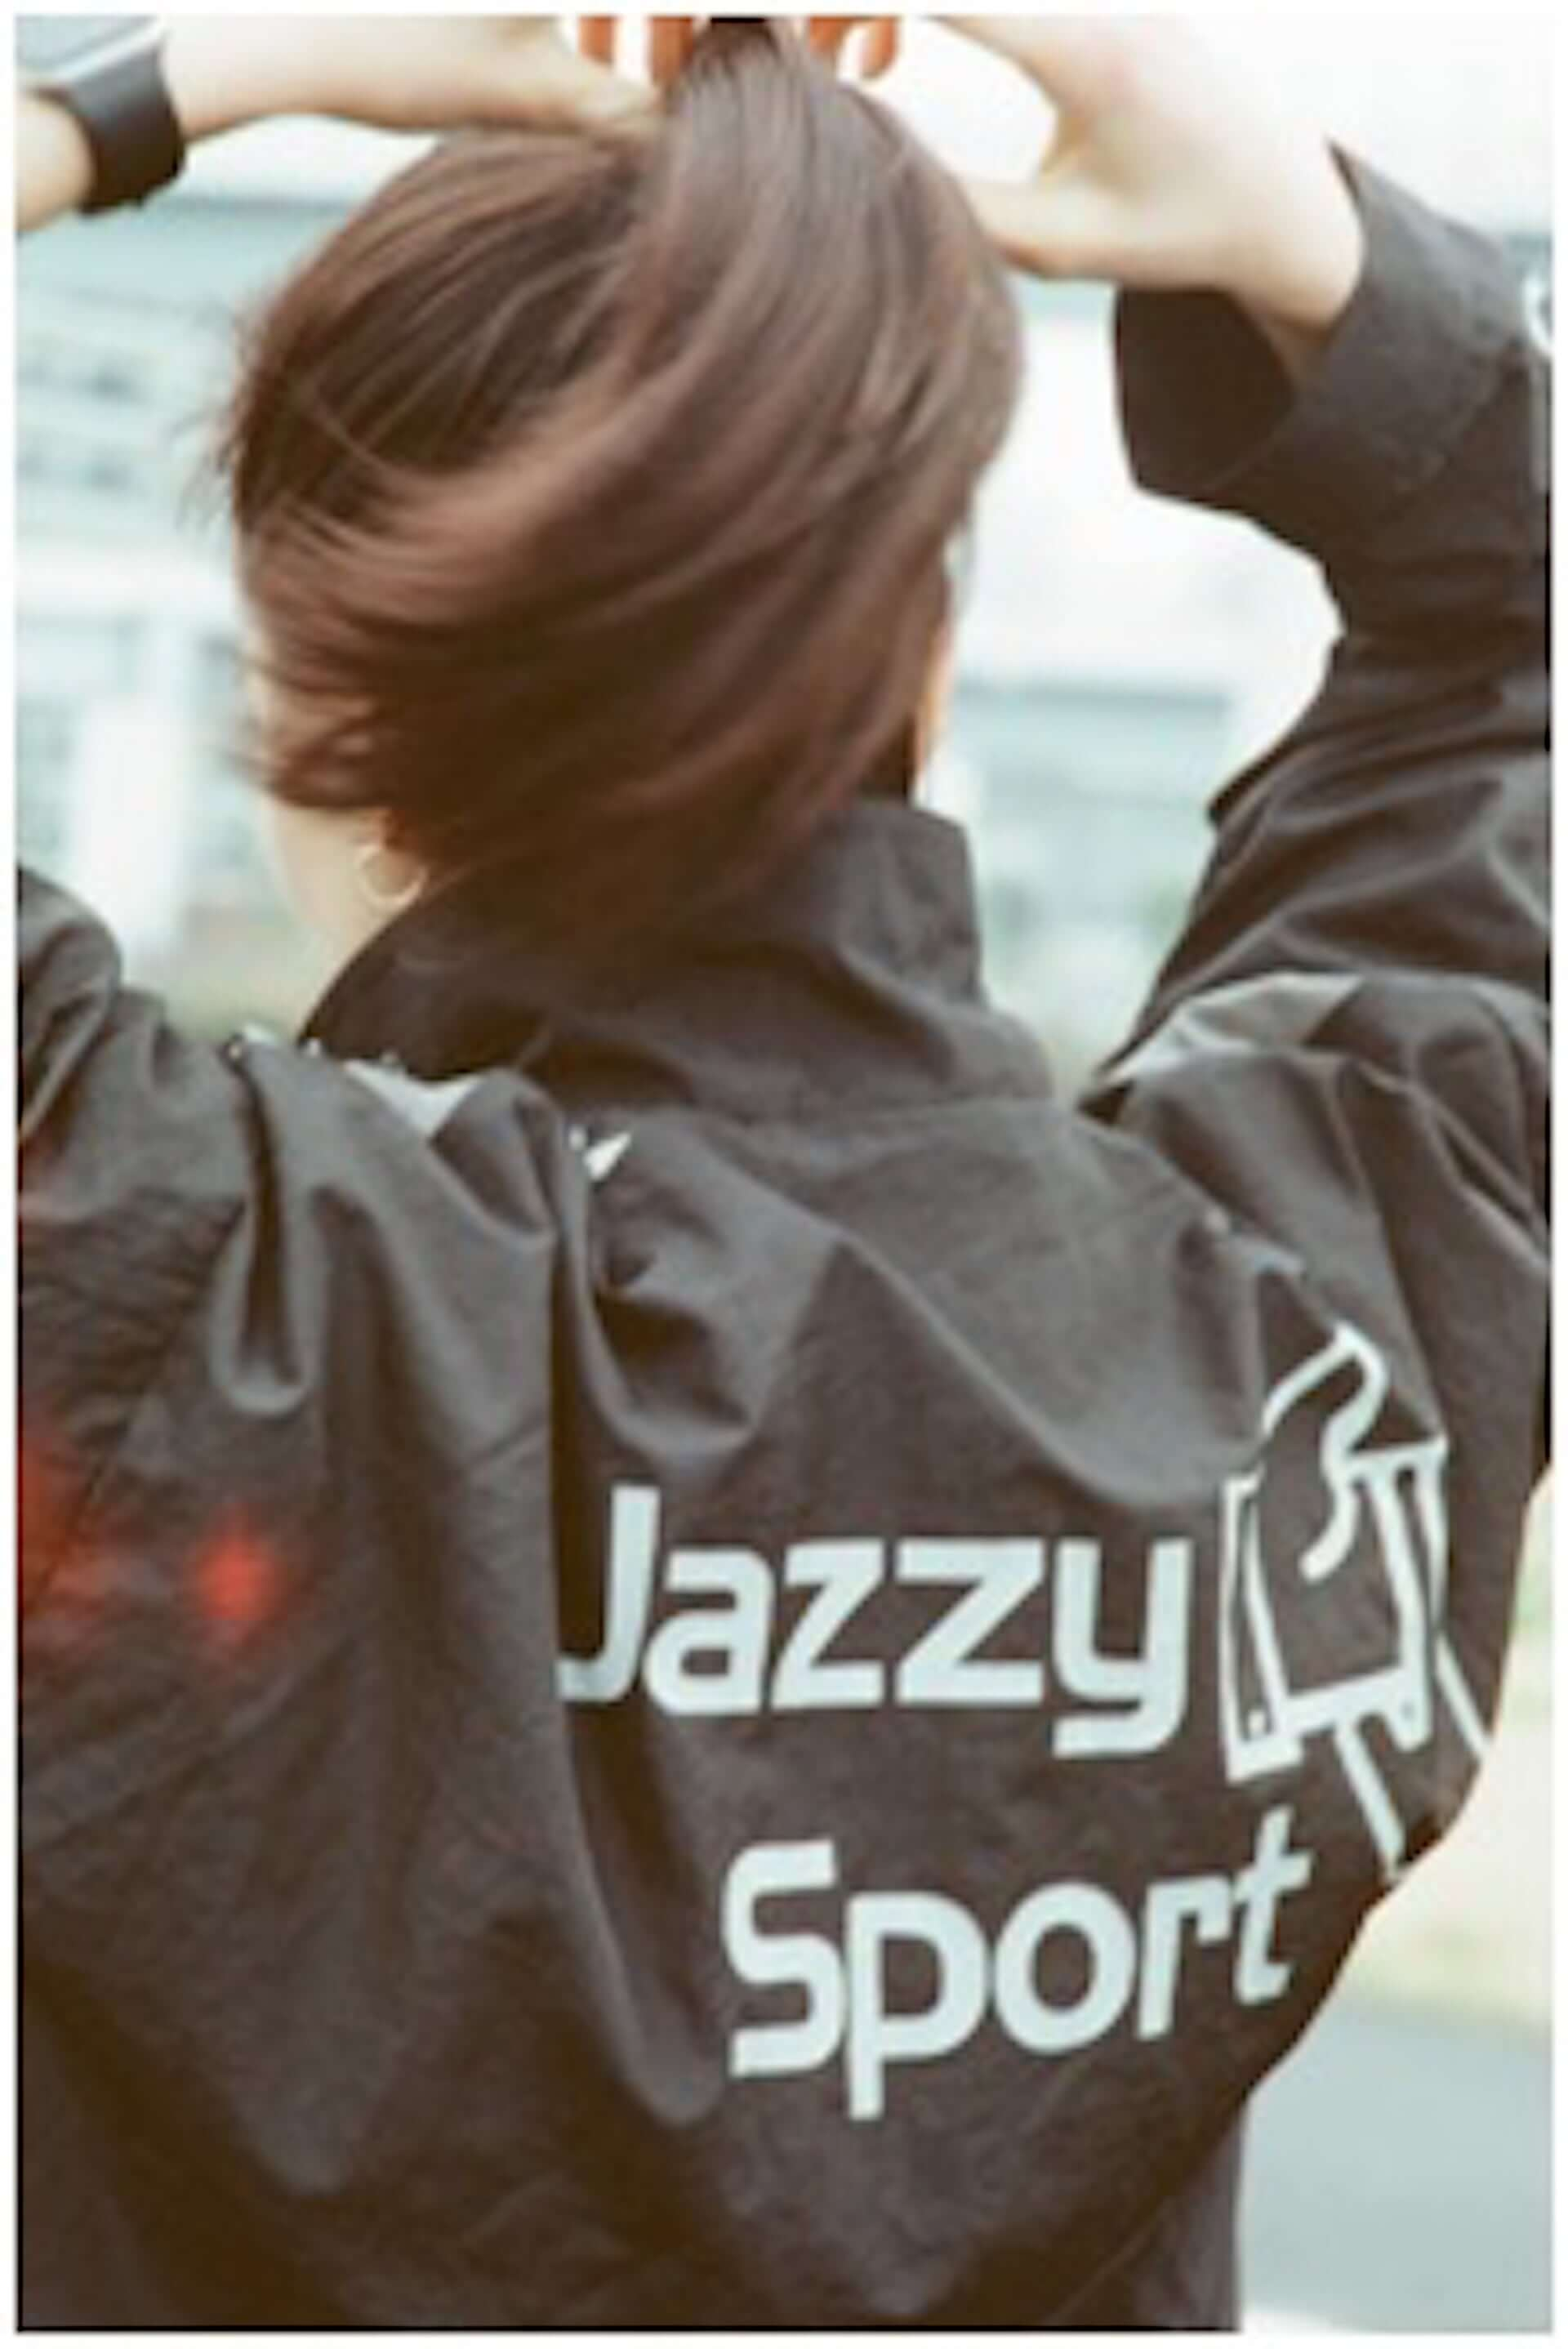 hummelとJazzy SportのコラボによるTシャツやナイロンジャケットが登場!BEAMS別注アイテムが20日に先行発売 life200317_hummel_jazzysport_2-1920x2876